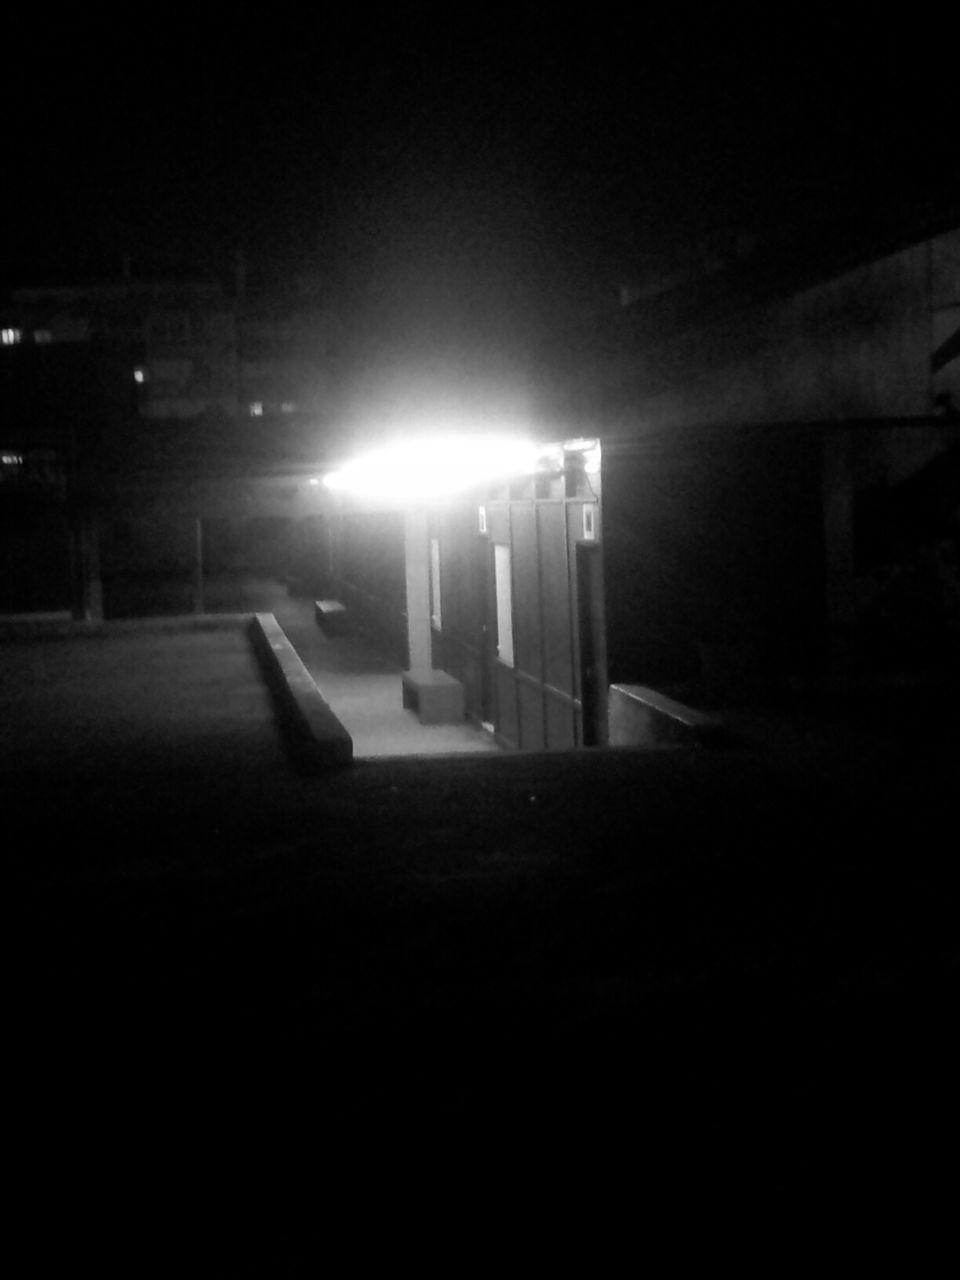 illuminated, night, lighting equipment, dark, no people, street light, outdoors, architecture, nature